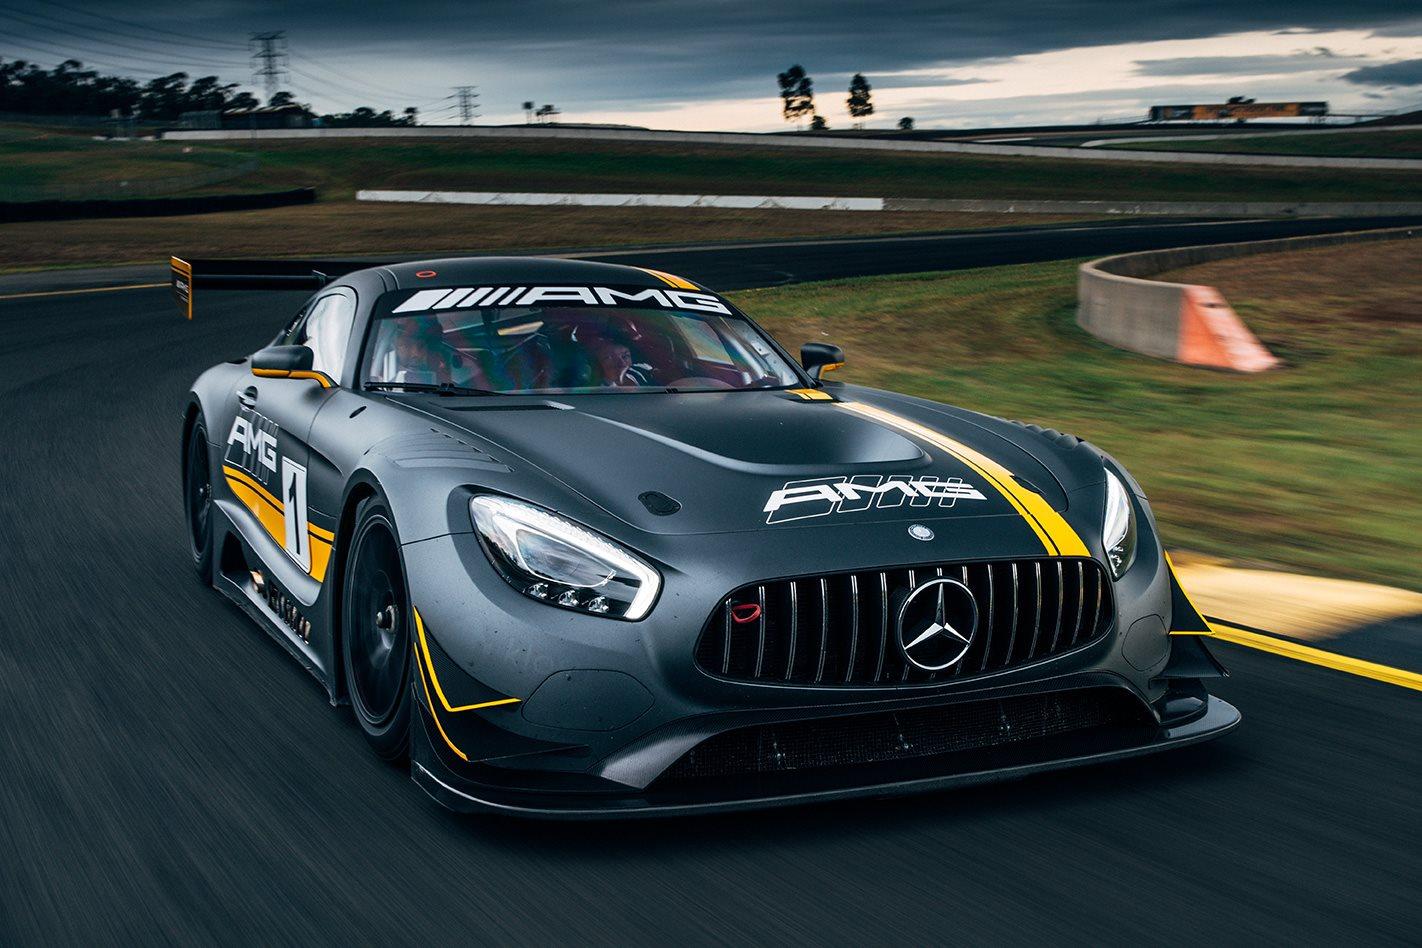 Drag Car 4k Wallpaper Mercedes Amg Gt3 Review